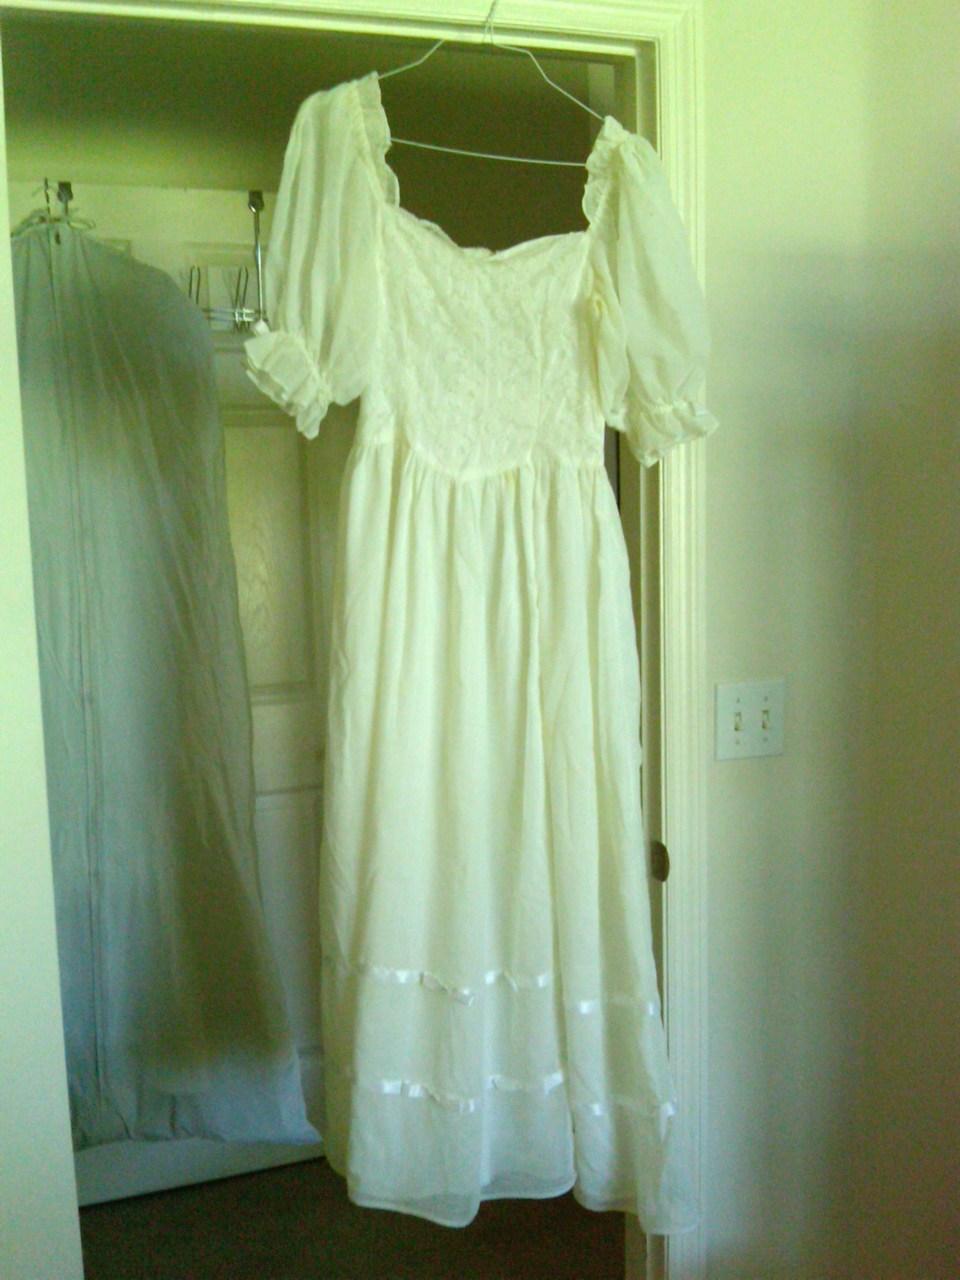 My mom's wedding dress, and mine hidden behind it.